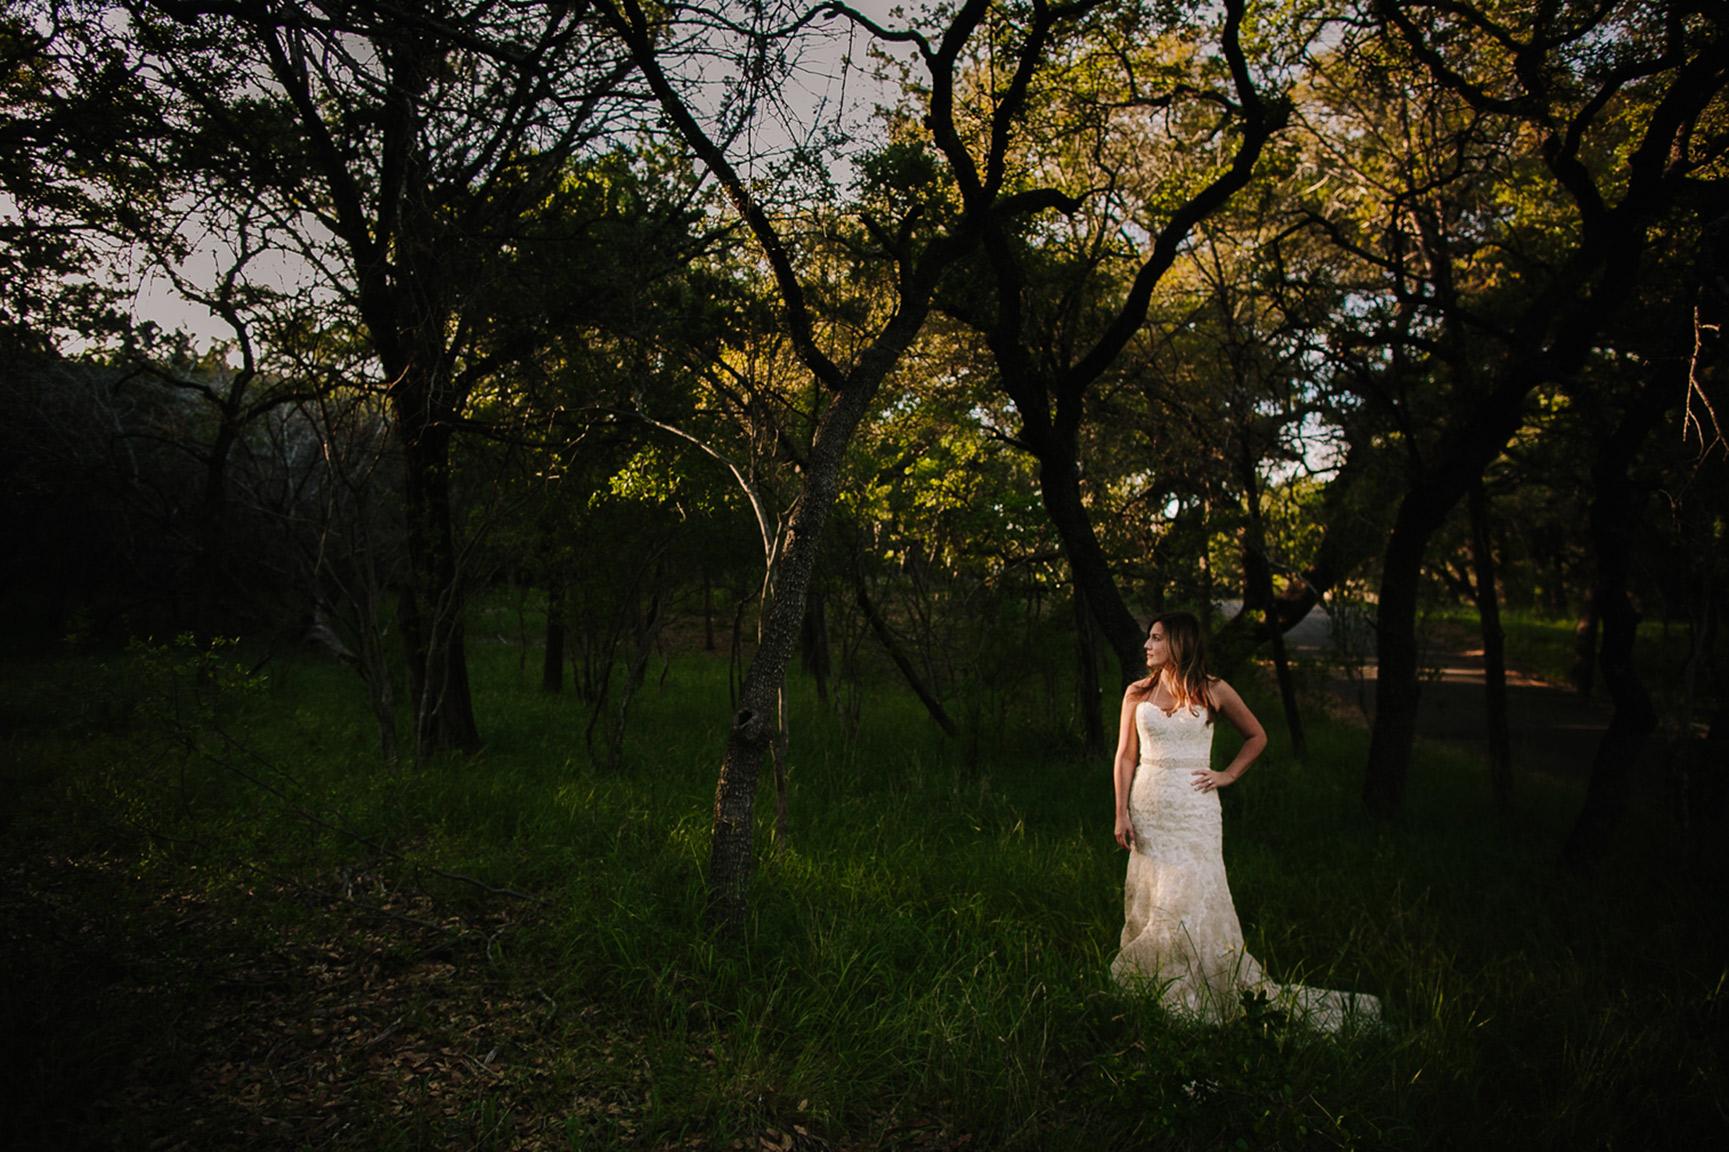 Austin_BRIDAL_WeddingPhotographer003.jpg